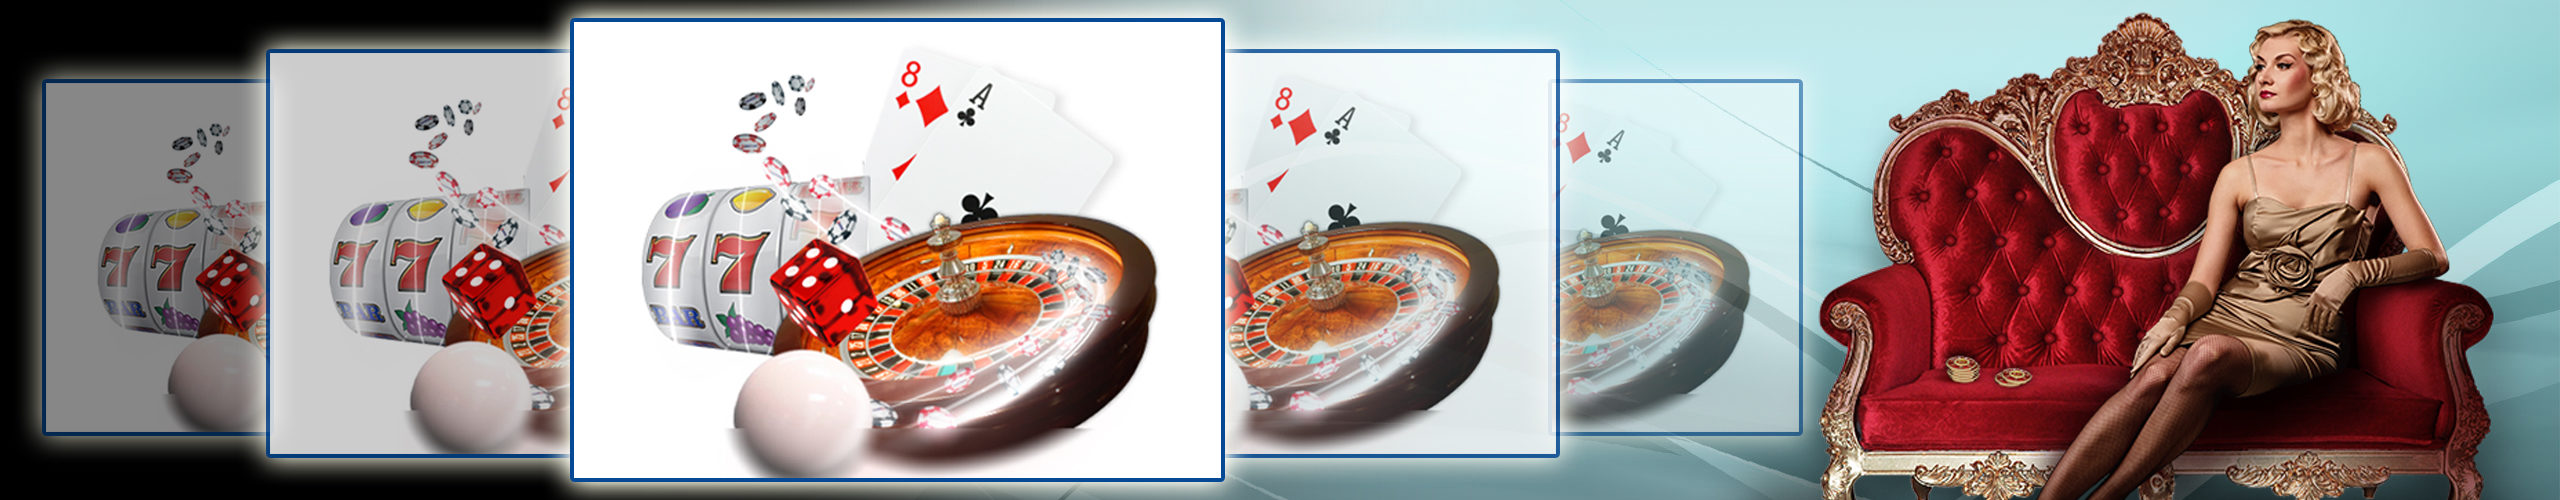 Web Casino Online